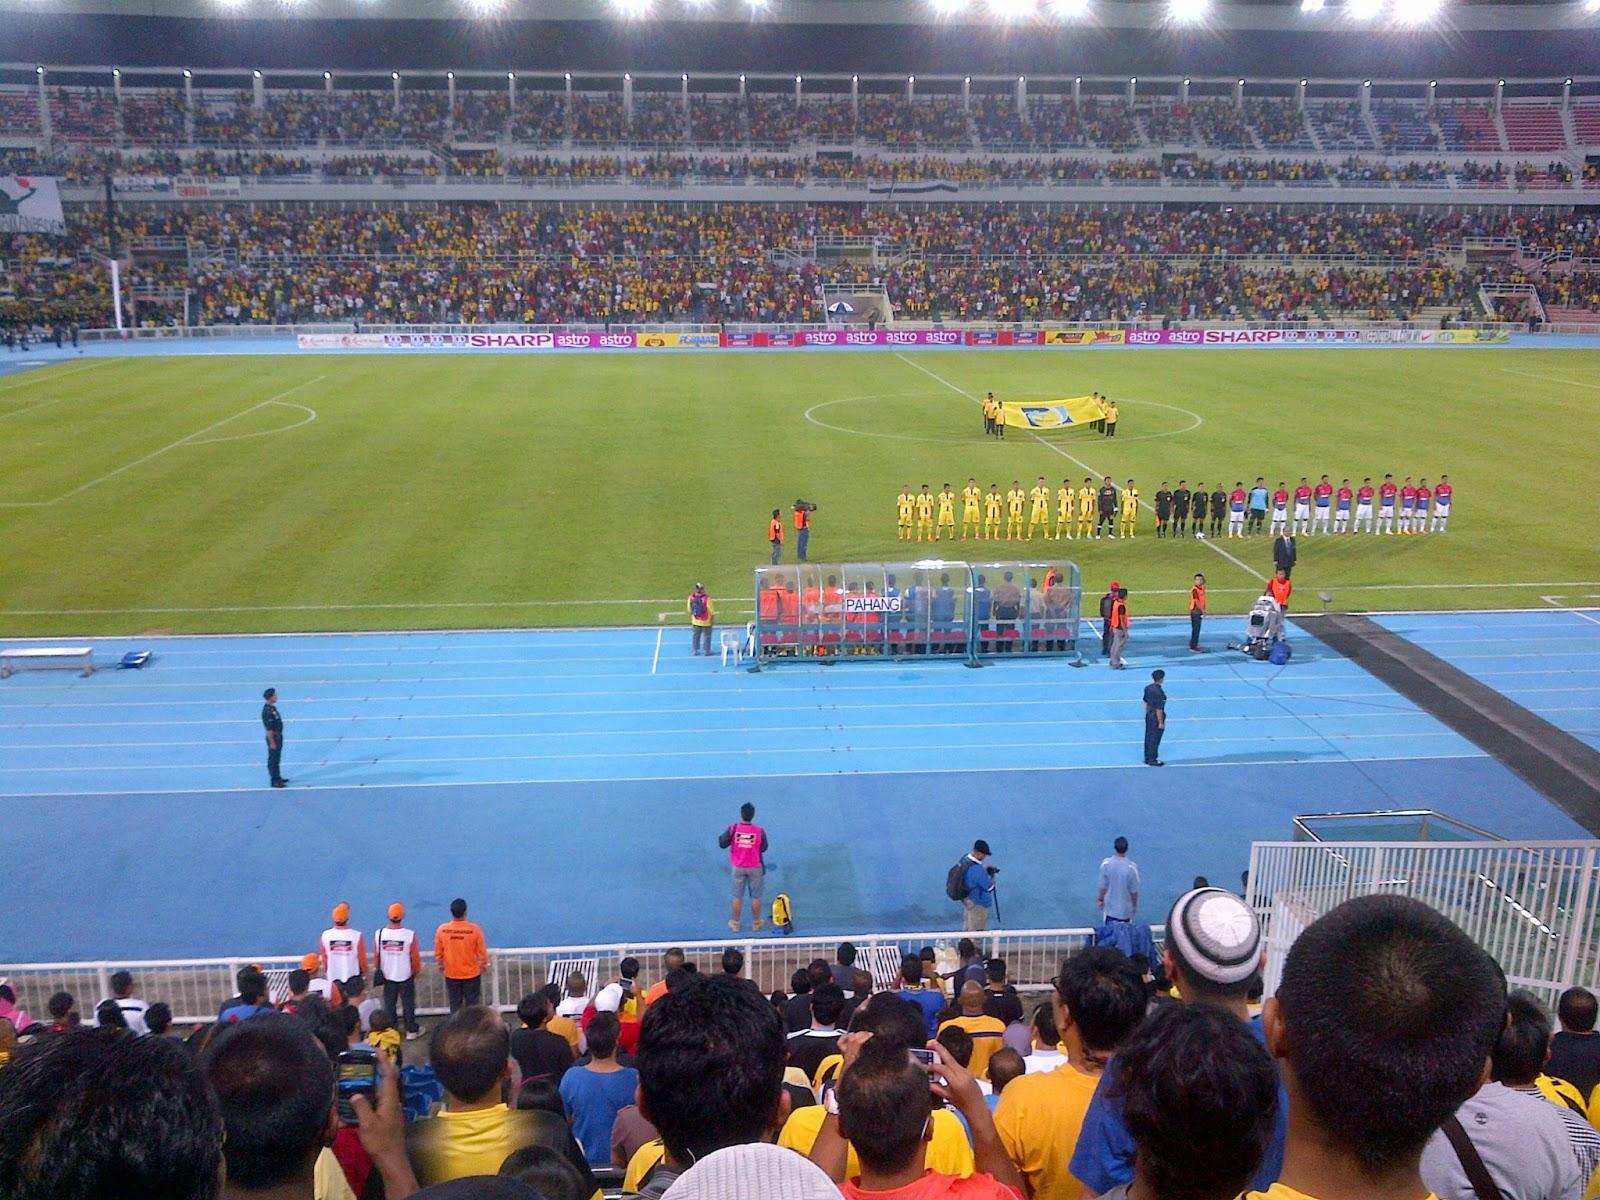 http://2.bp.blogspot.com/-UFkz0A3FjO0/UO57nhY1_7I/AAAAAAAADO0/DeZSV1LJvkQ/s1600/Liga+Super+-+Pahang+vs+Johor+Darul+Takzim+FC4.jpg